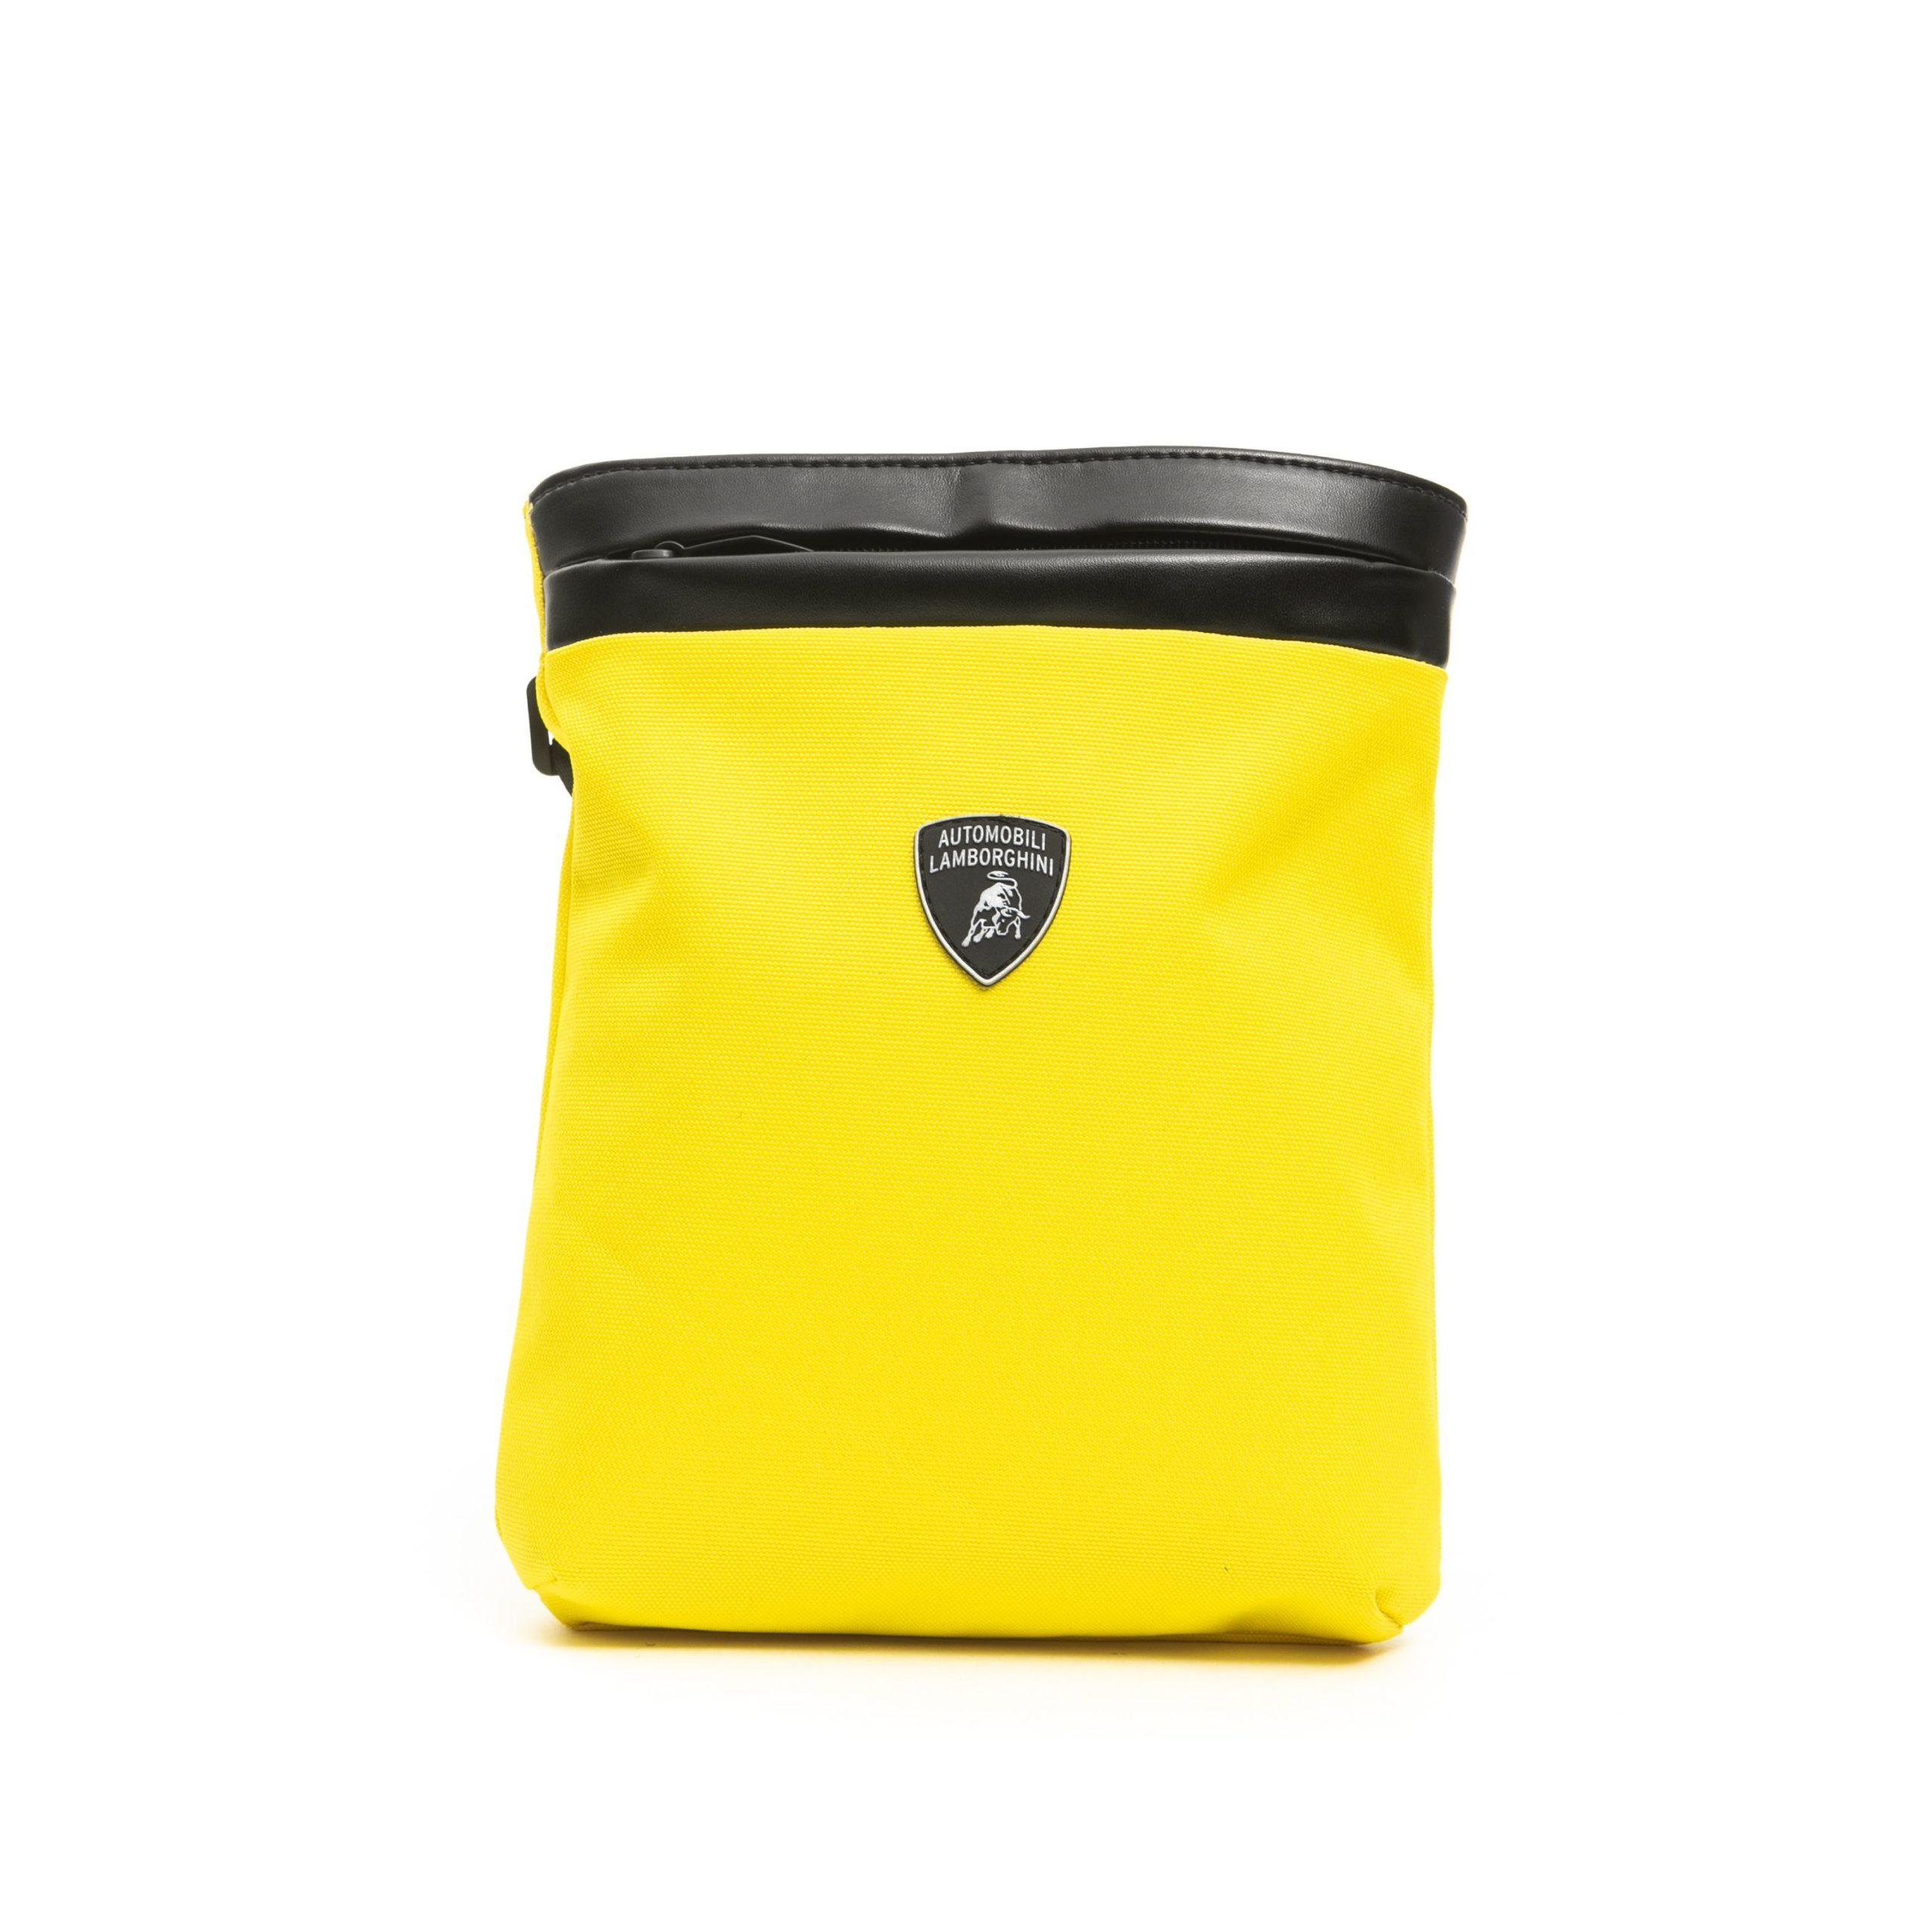 Lamborghini Men's Giallo Messenger Bag Yellow LA1265739